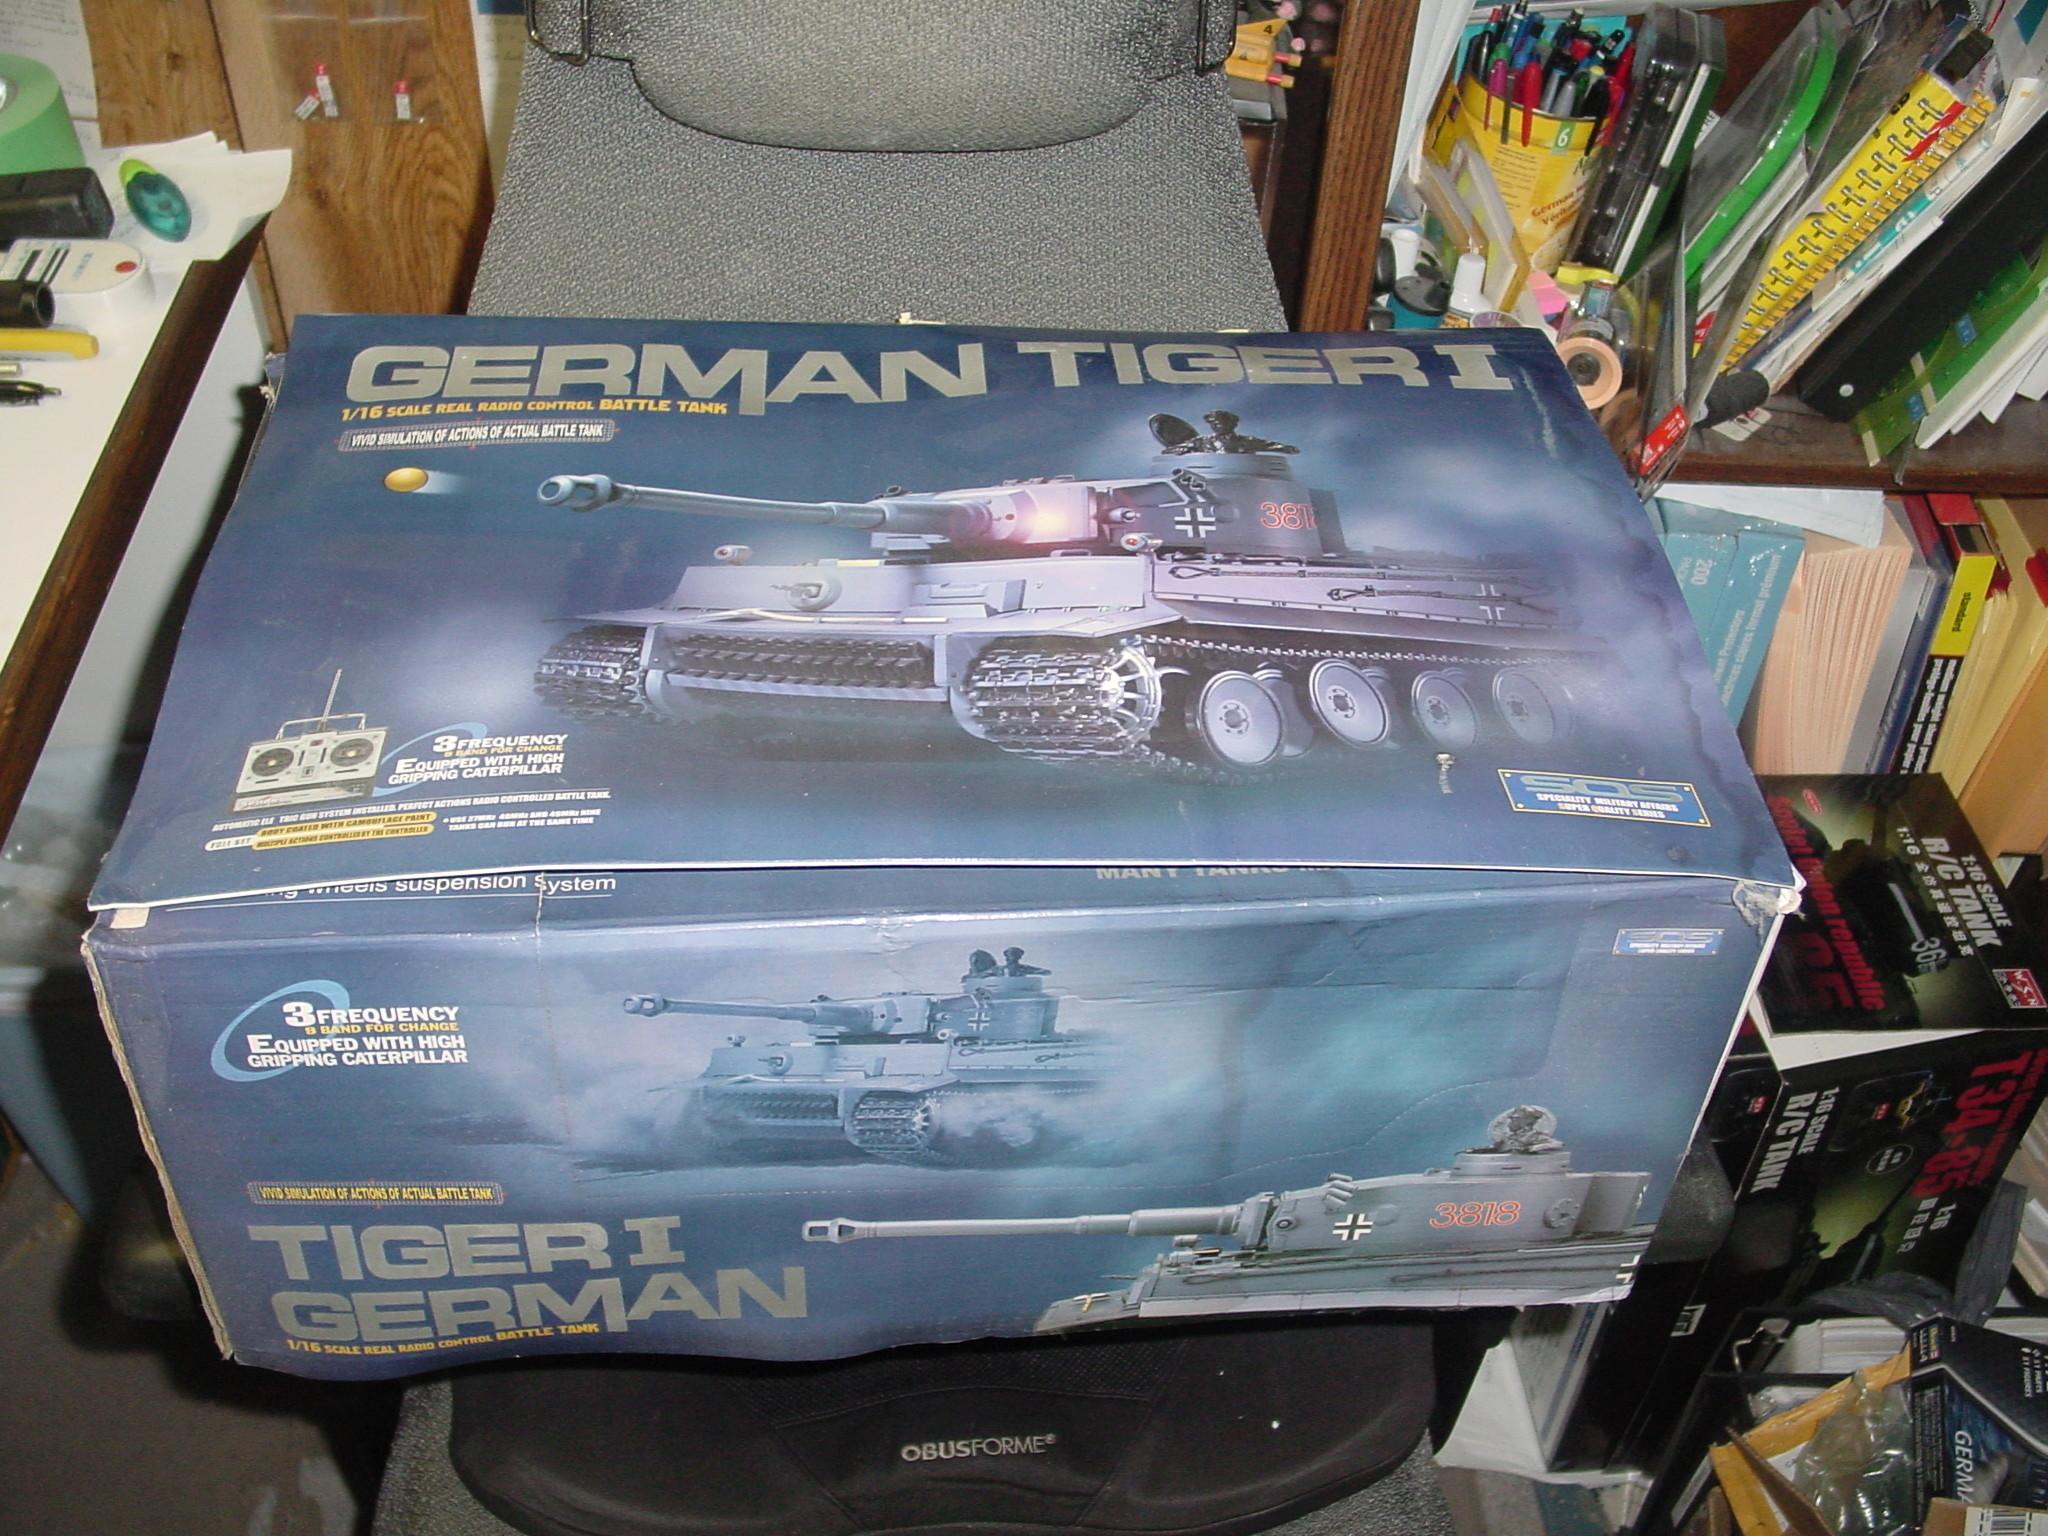 1/16 Heng Long Tiger 1 R.C Tank Dsc00025